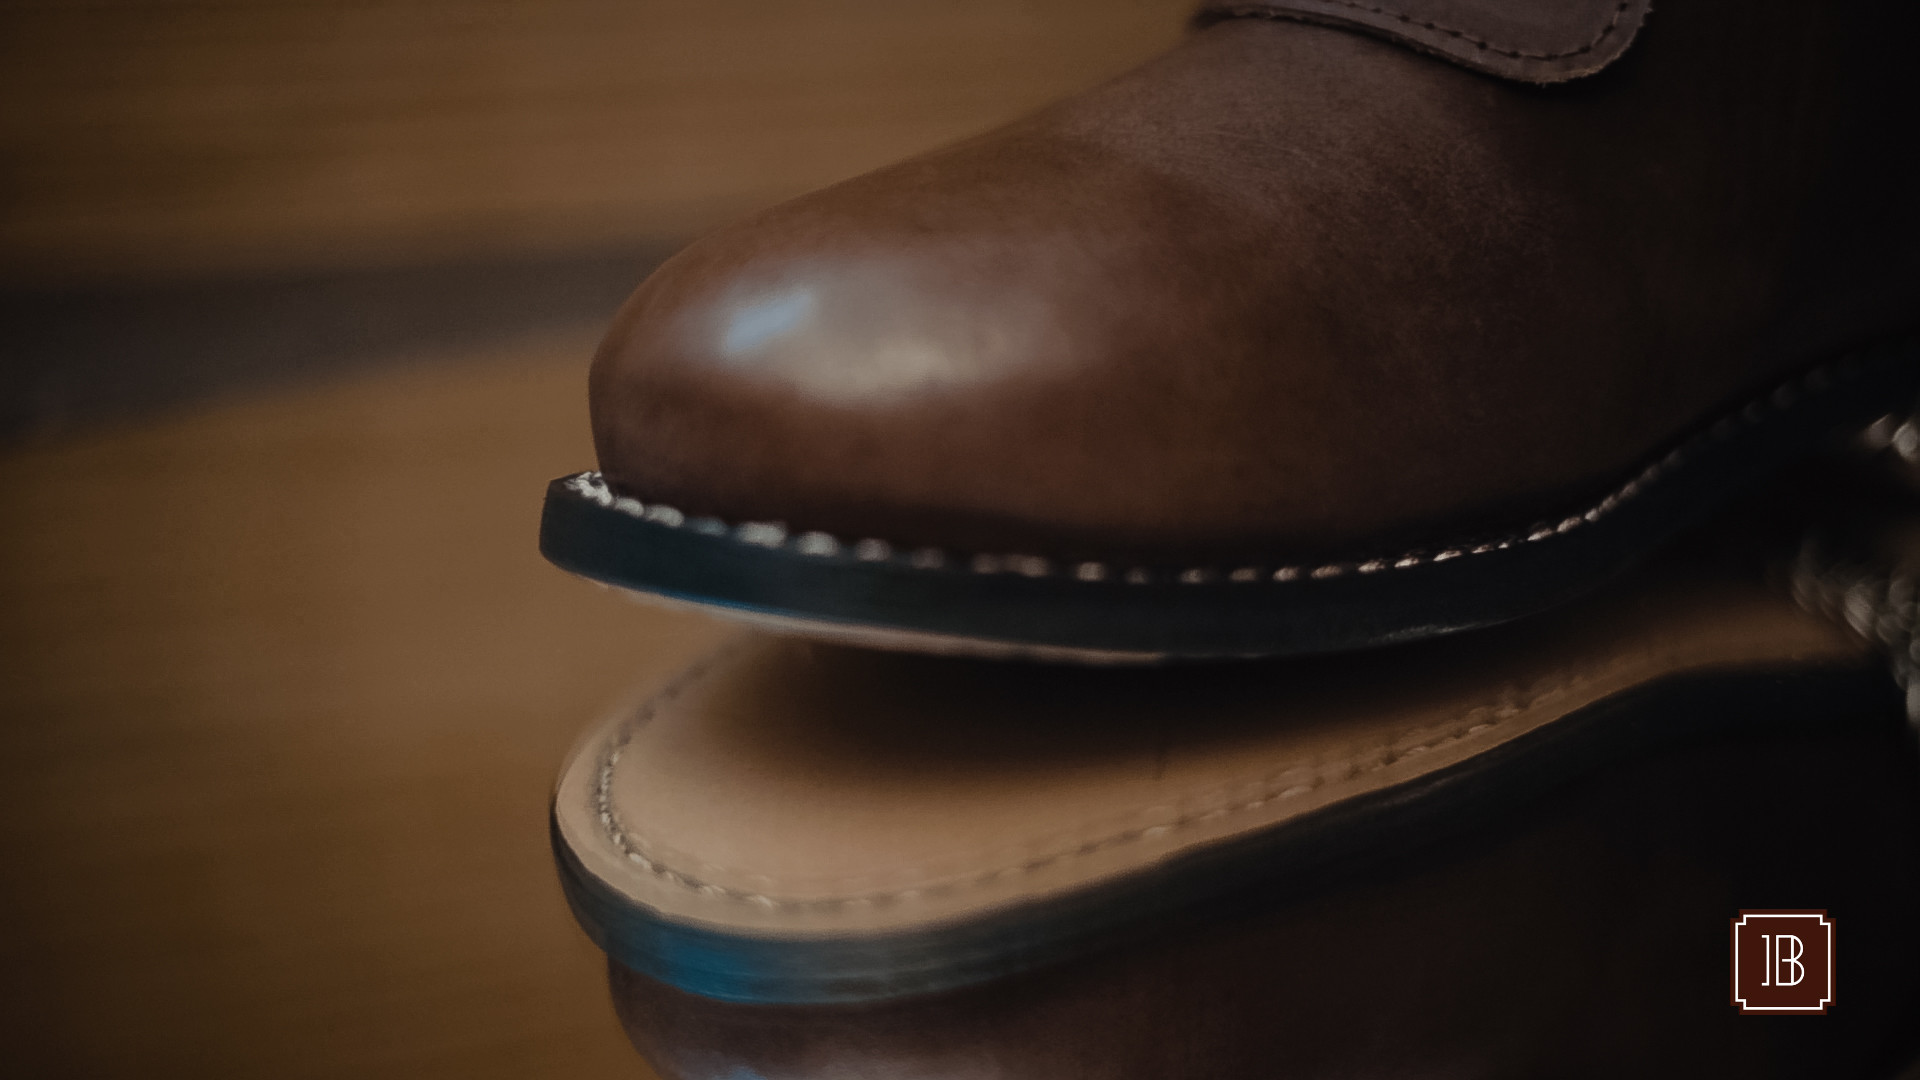 Goodyear welt stitcing on boots.